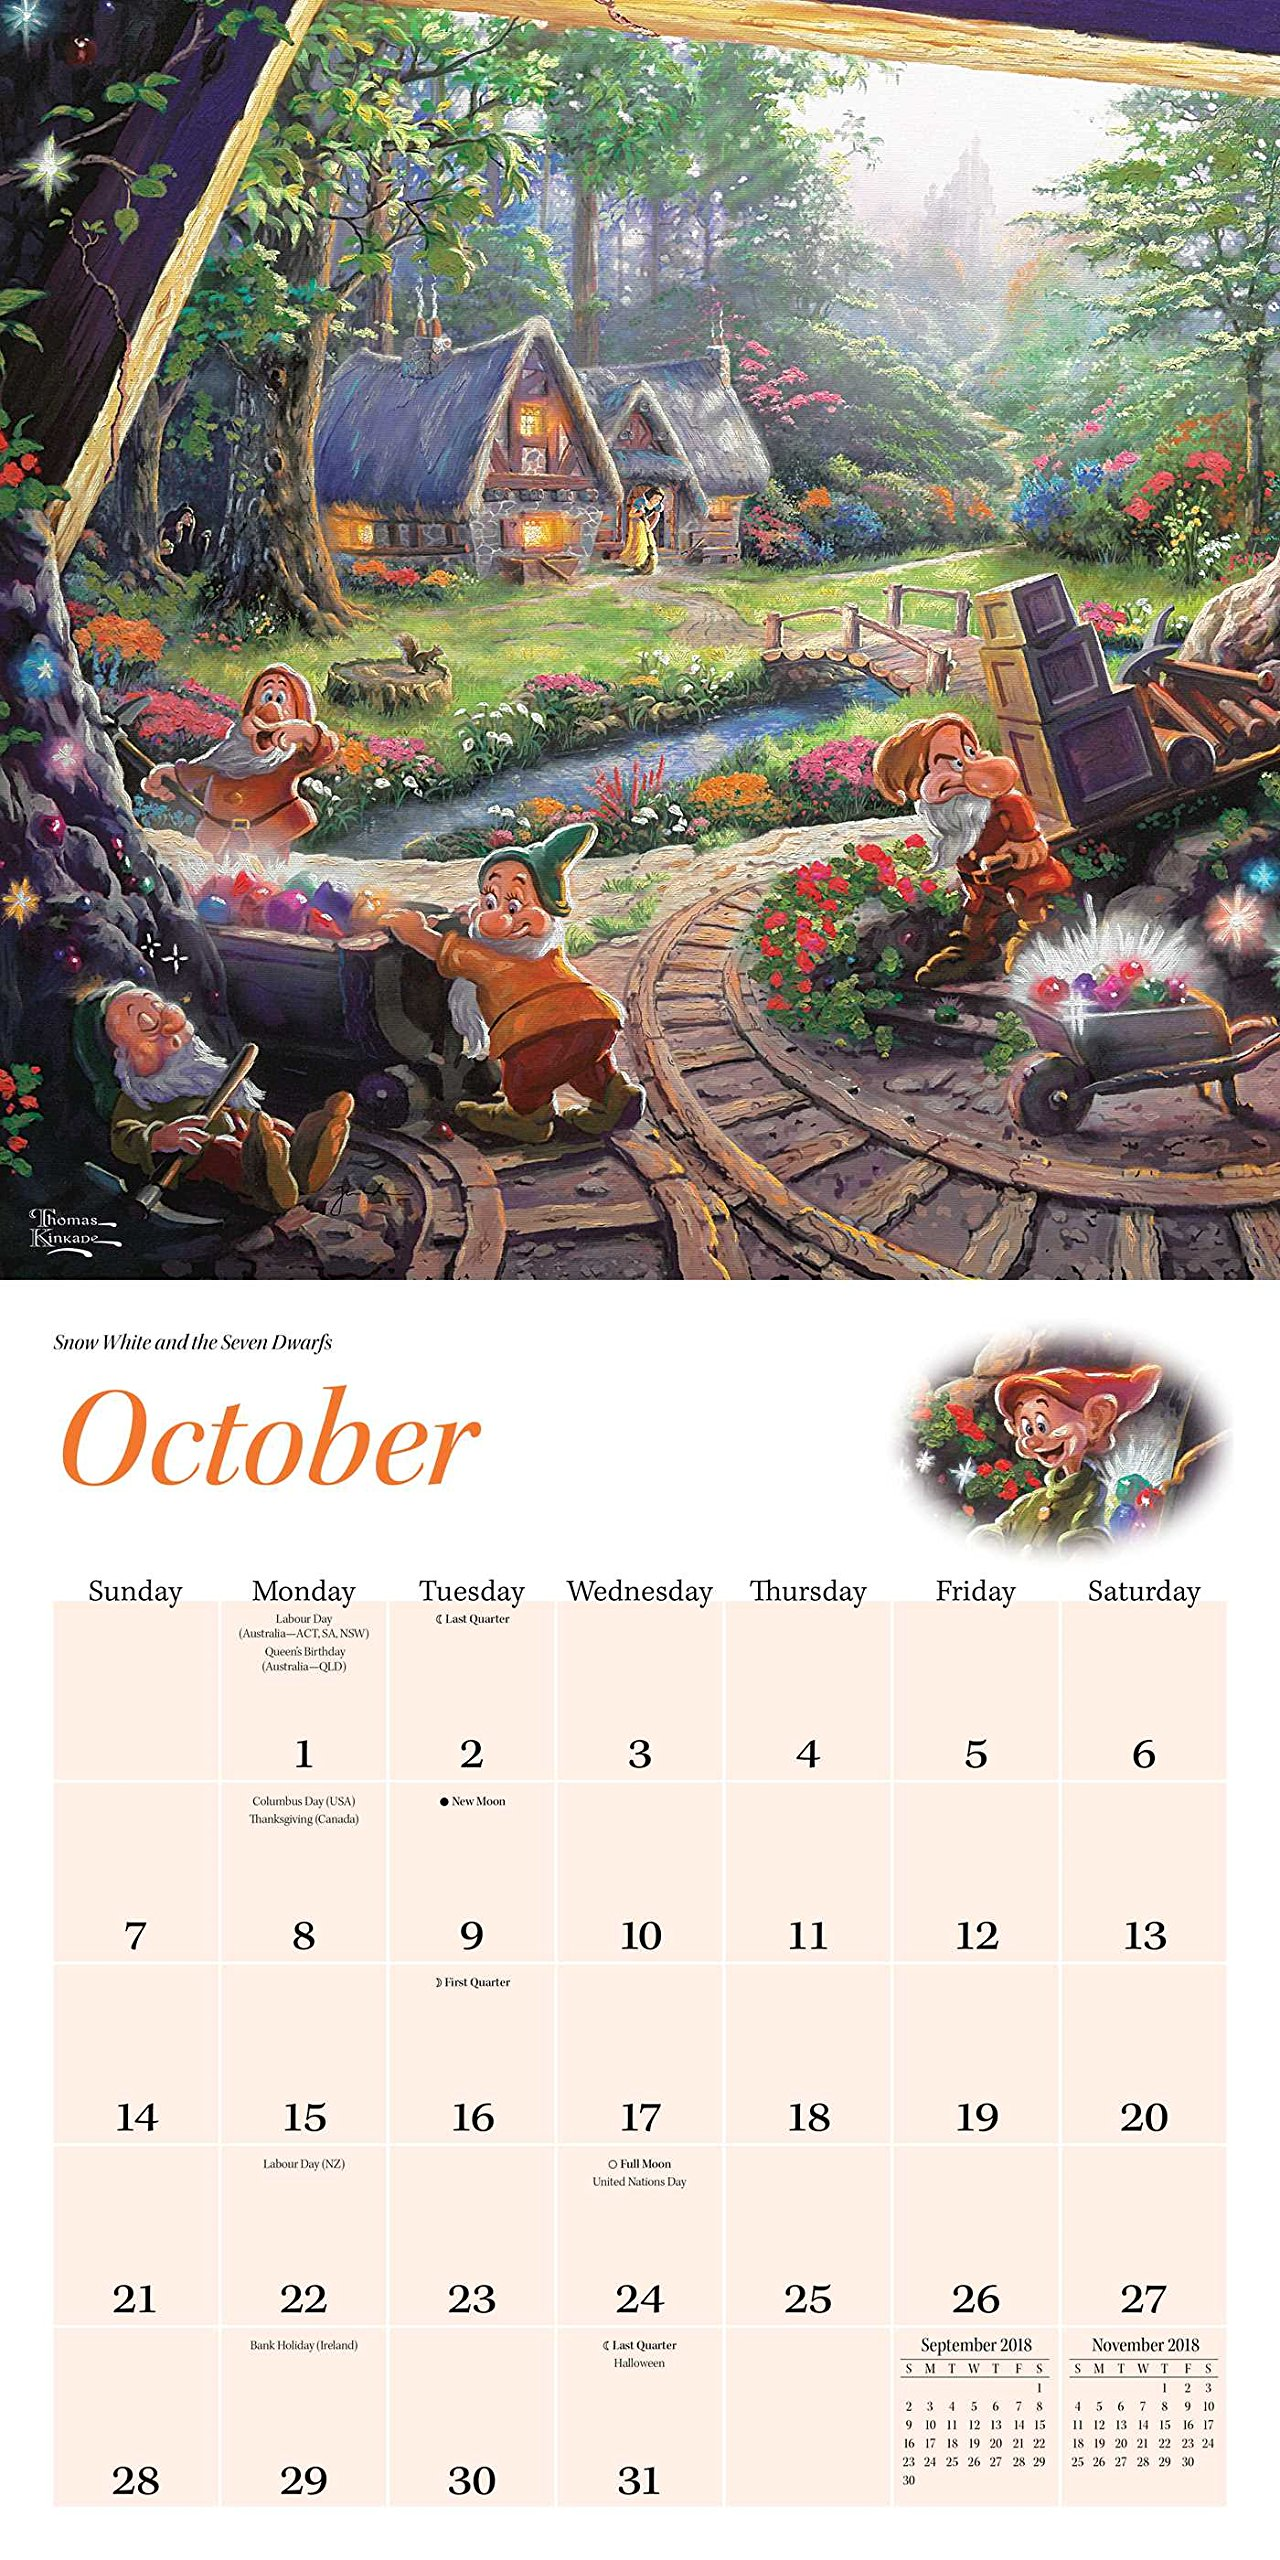 Amazon.com: Thomas Kinkade: The Disney Dreams Collection 2018 Wall Calendar  (0762042136917): Thomas Kinkade: Books